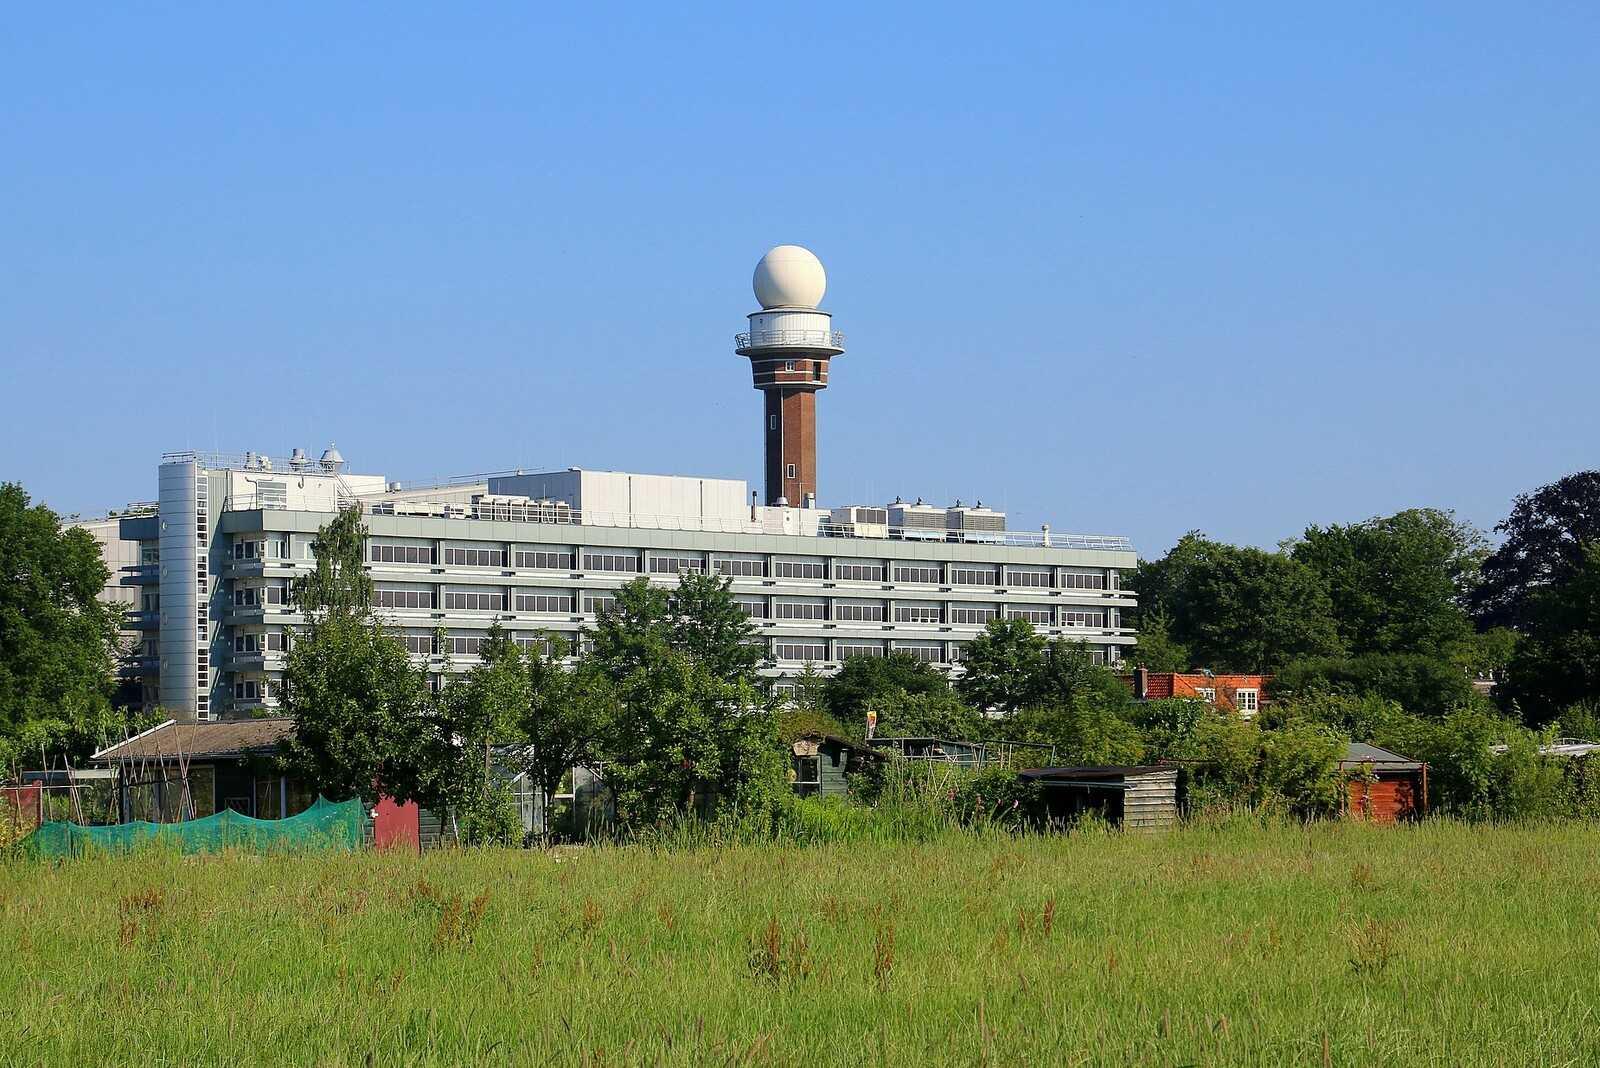 Бывший радар KNMI в Де Билте. Фото: Frans Sellies/Wikimedia.